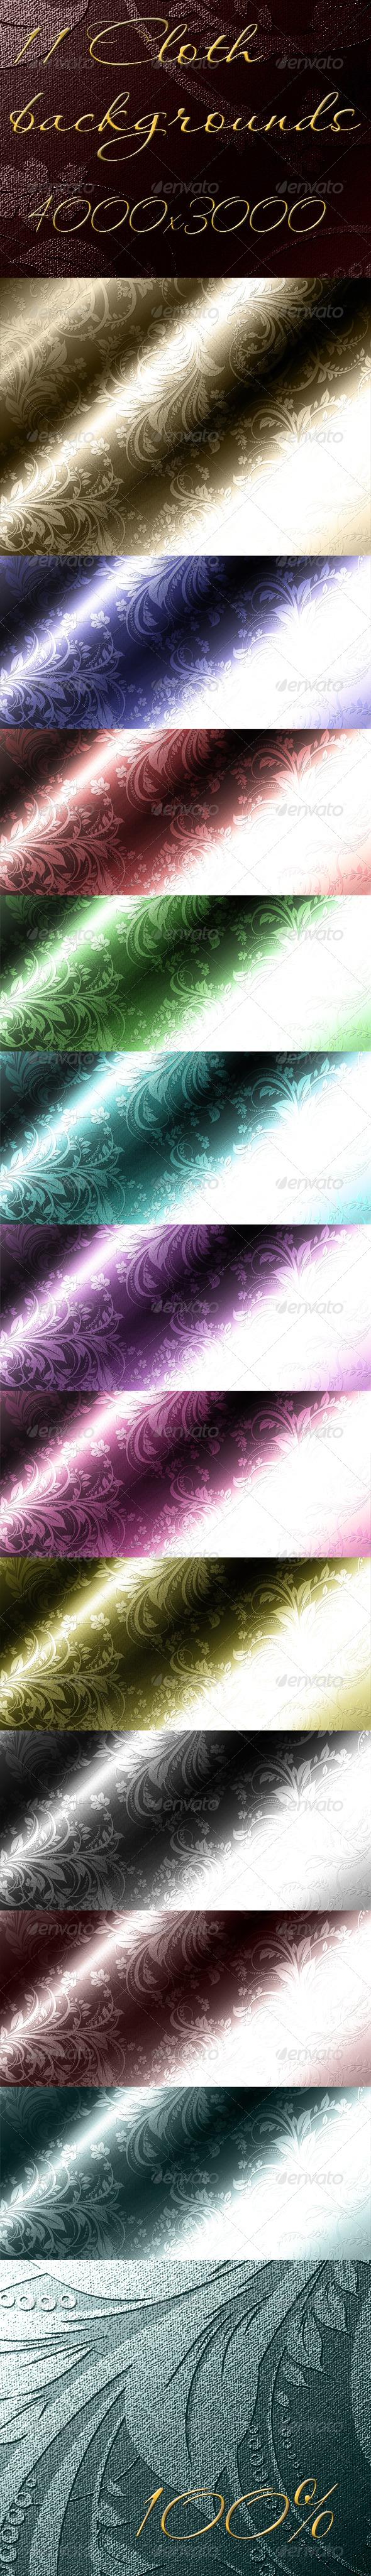 GraphicRiver Cloth 5344454